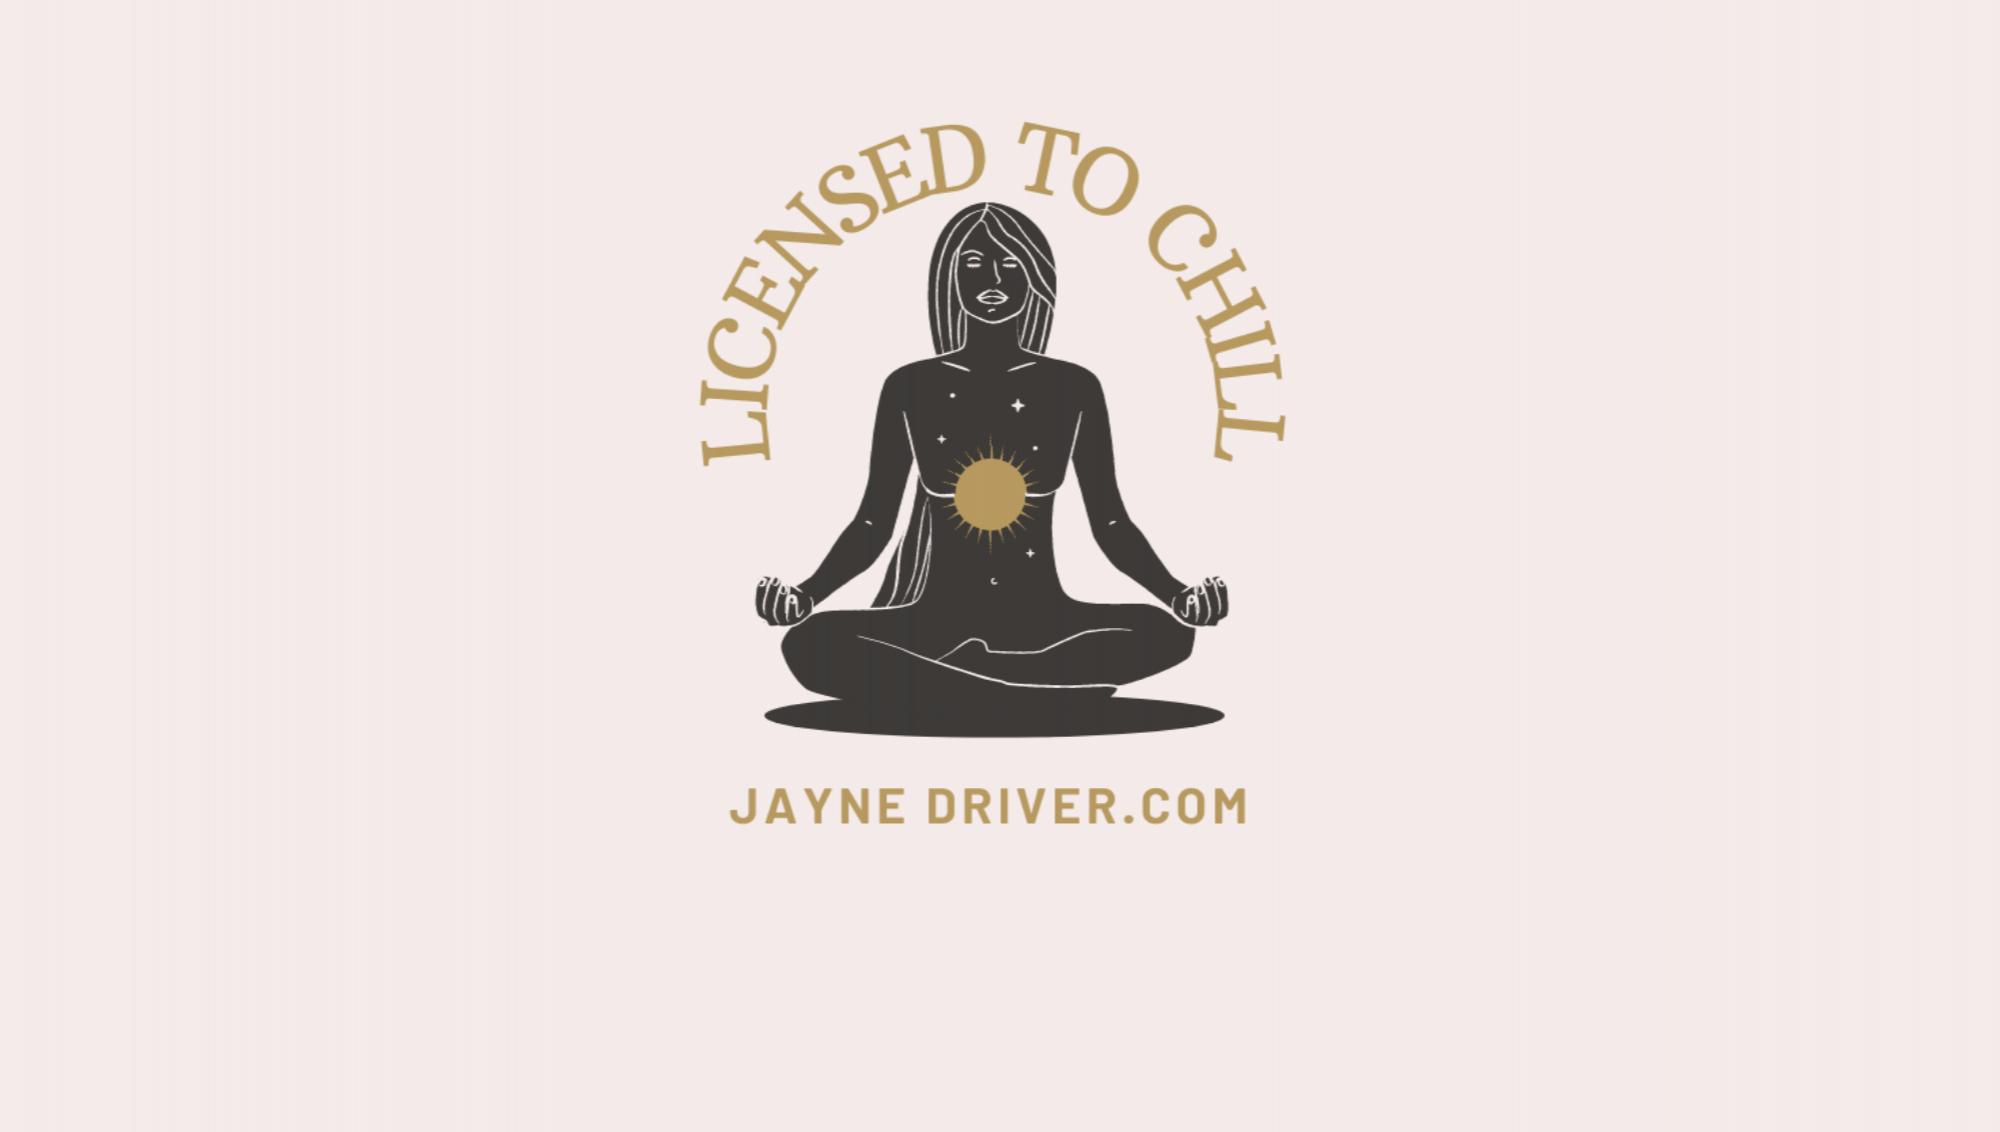 jaynedriver.com